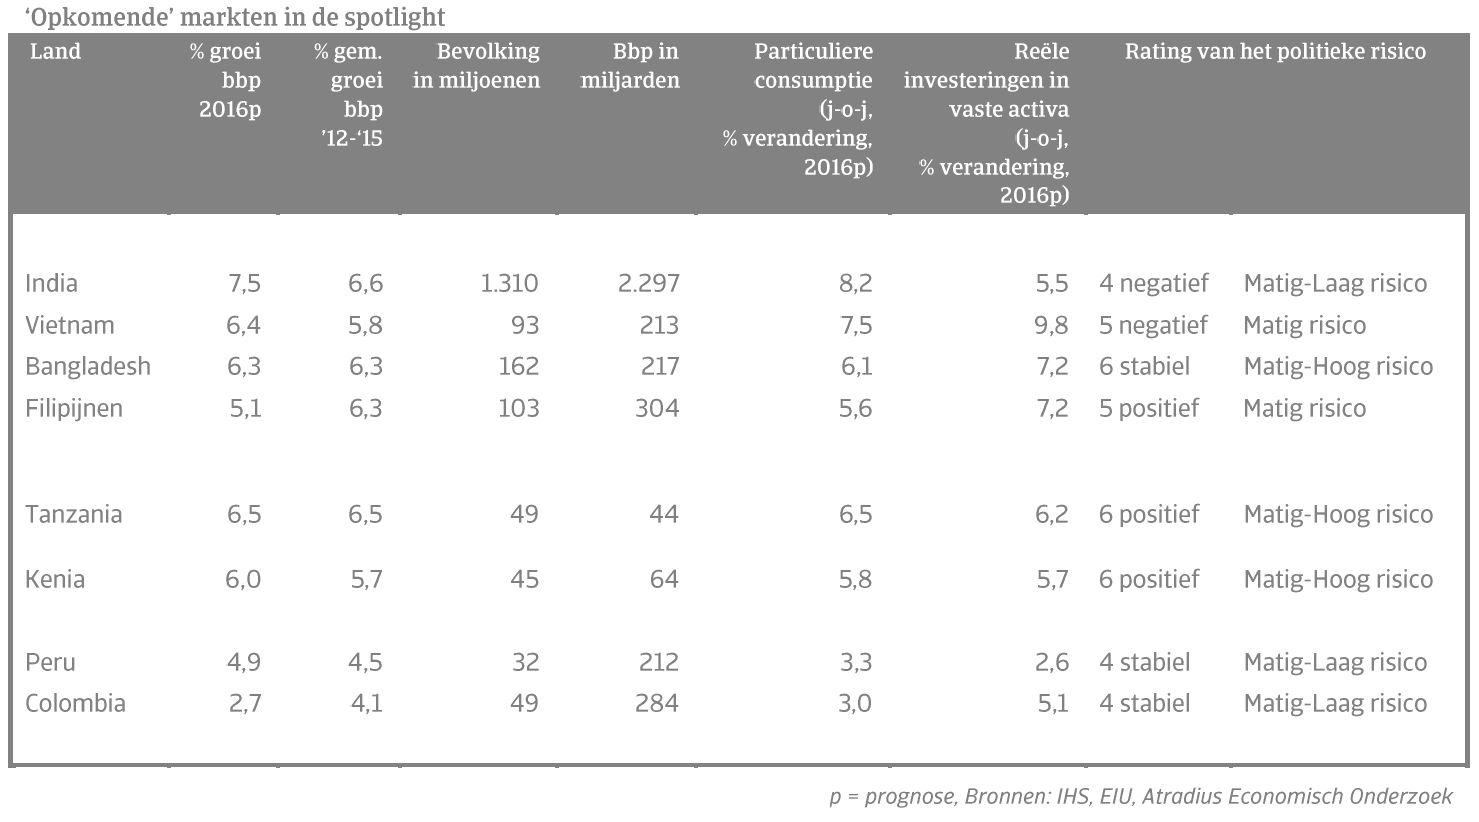 Opkomende markten in de spotlight